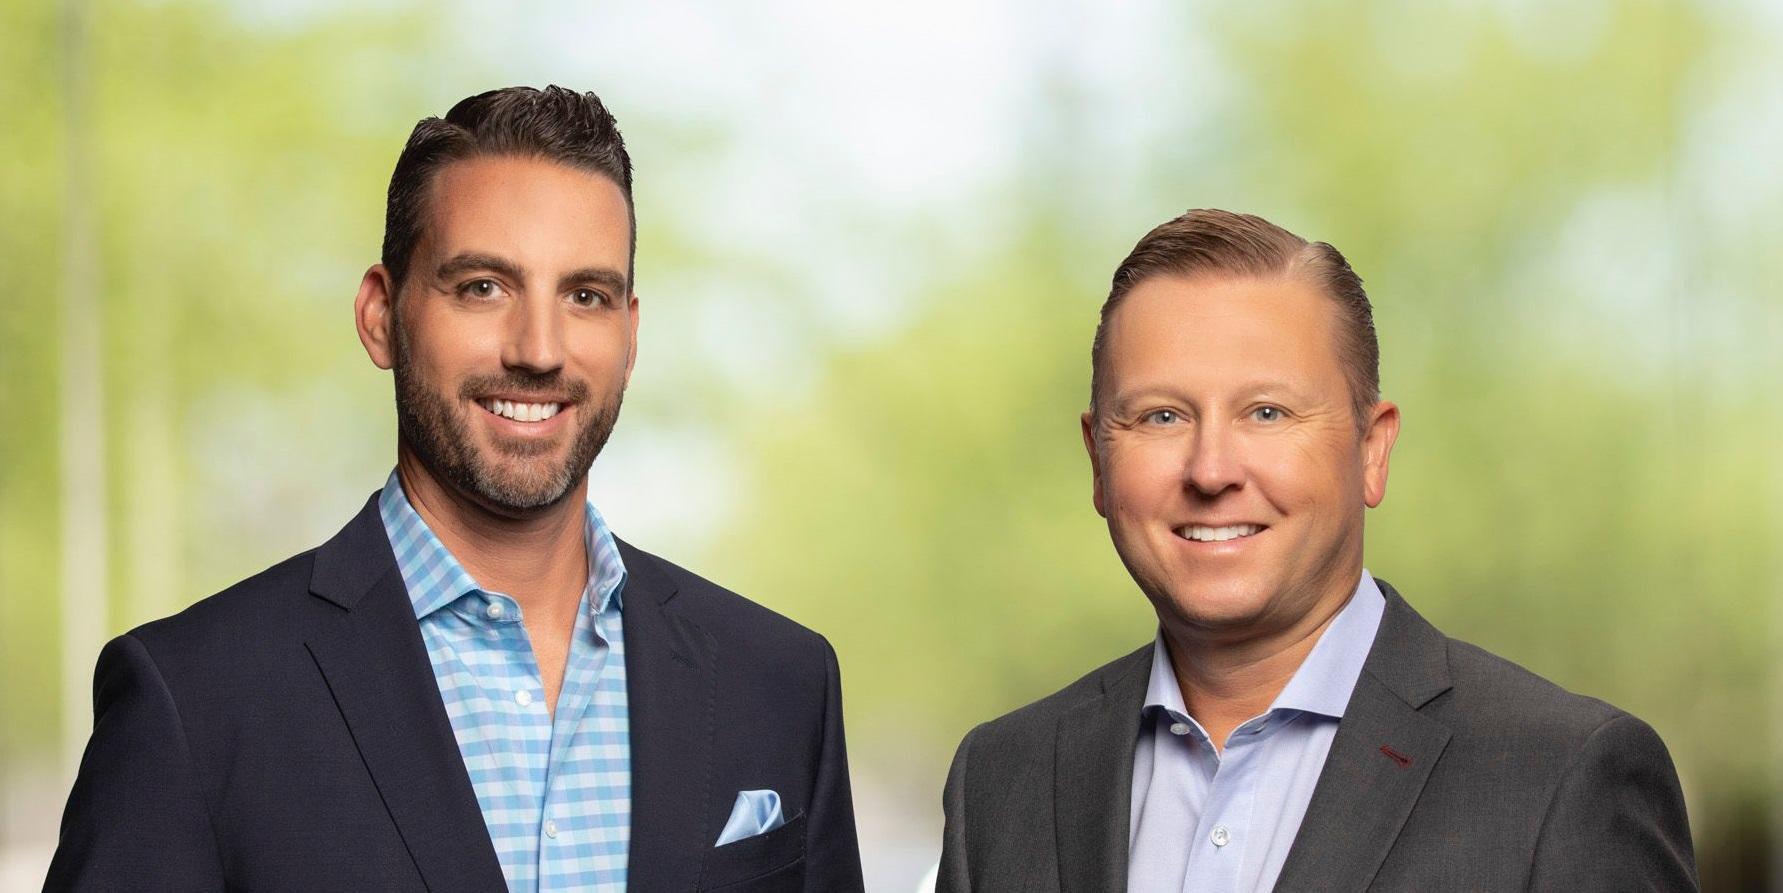 Mike McGinley James Dwyer Financial Advisors Chandler Arizona